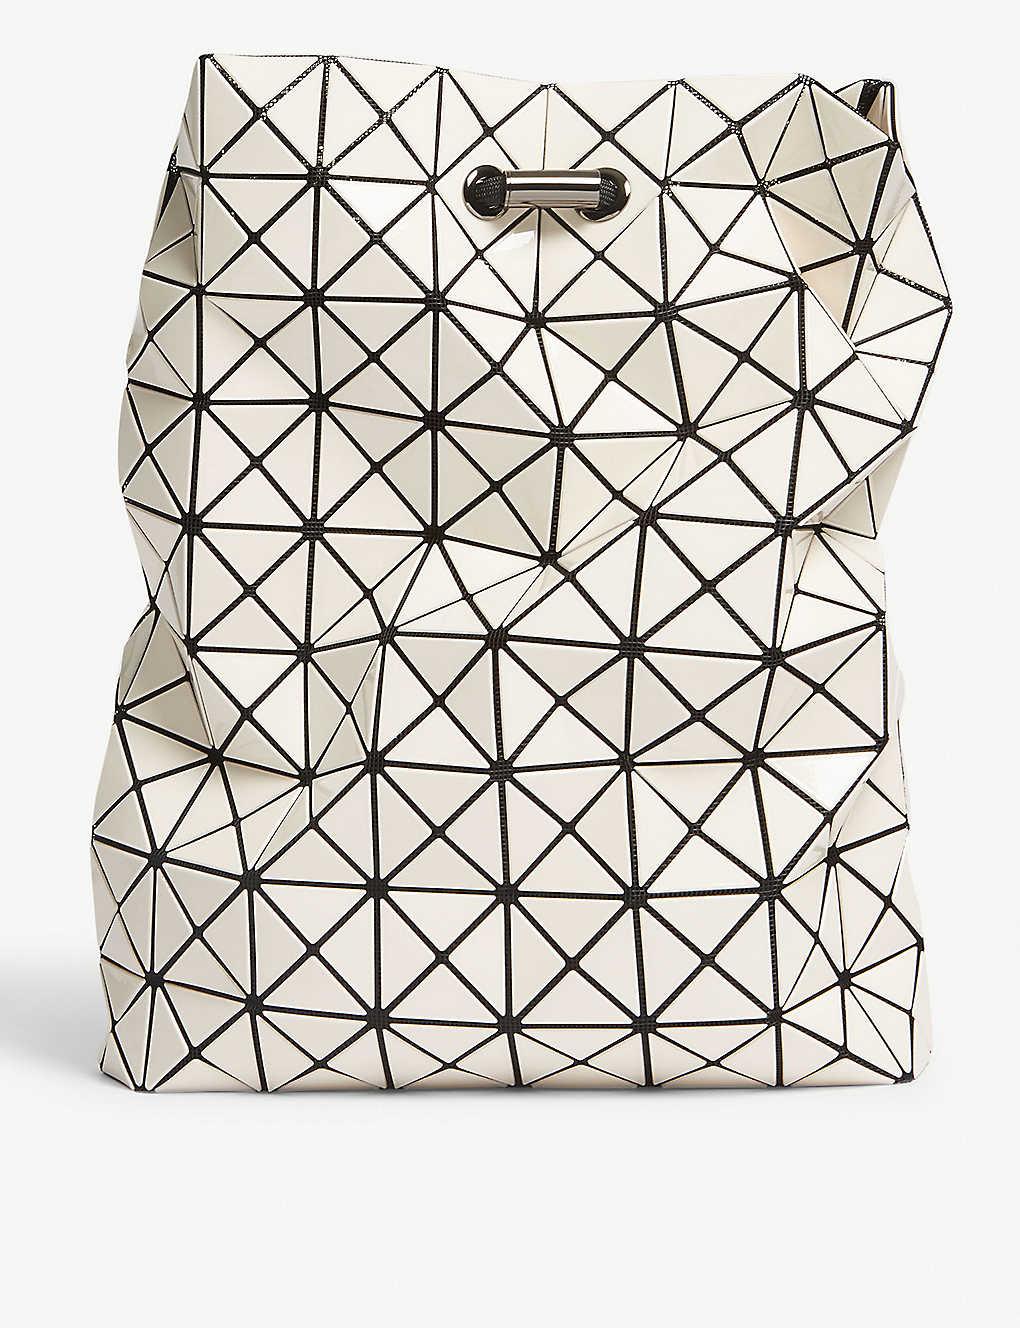 BAO BAO ISSEY MIYAKE - Wring prism backpack  a4345026b7e62